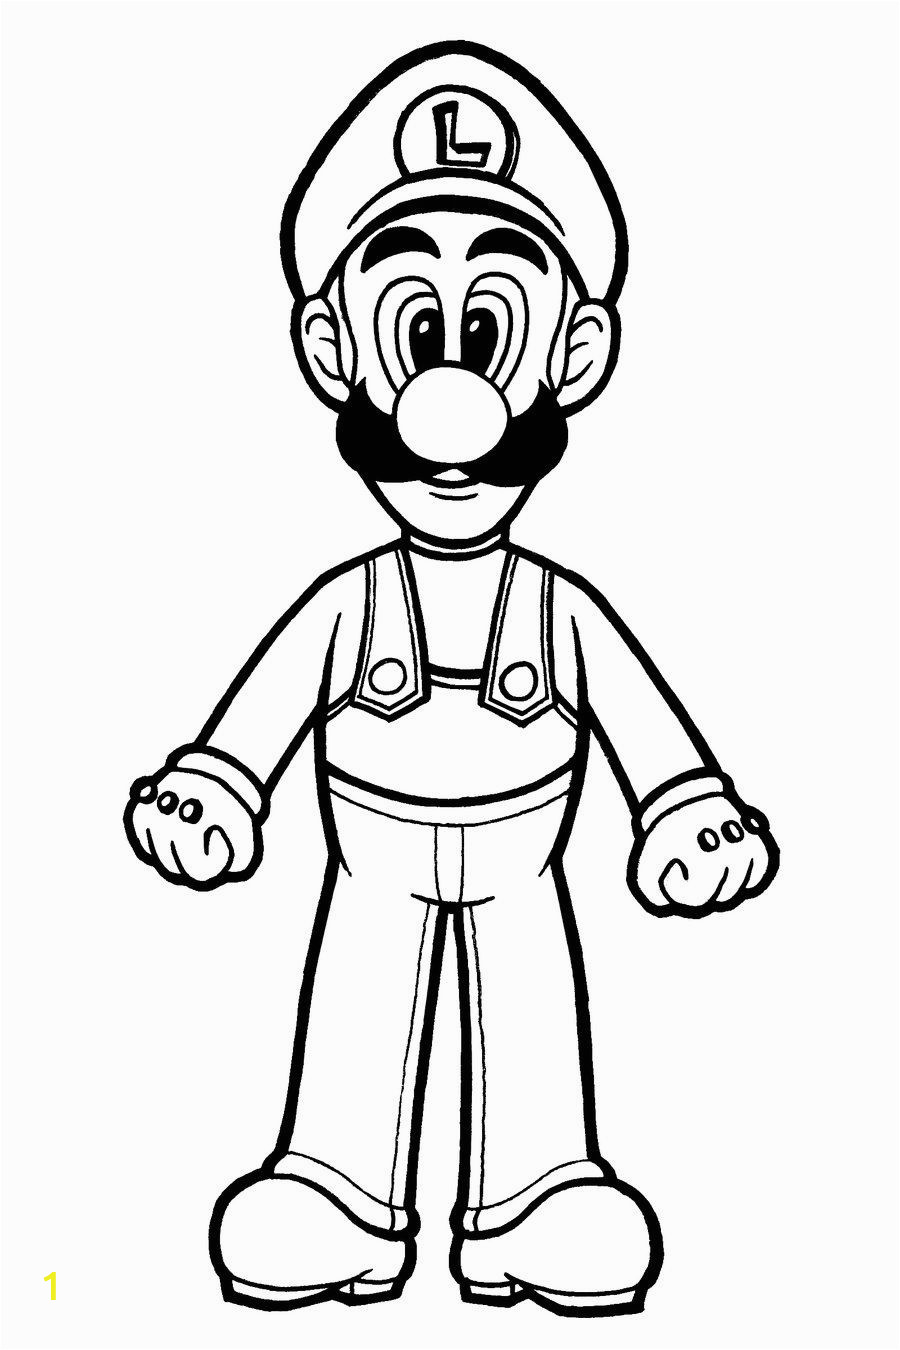 Super Mario 3d World Coloring Pages | divyajanani.org